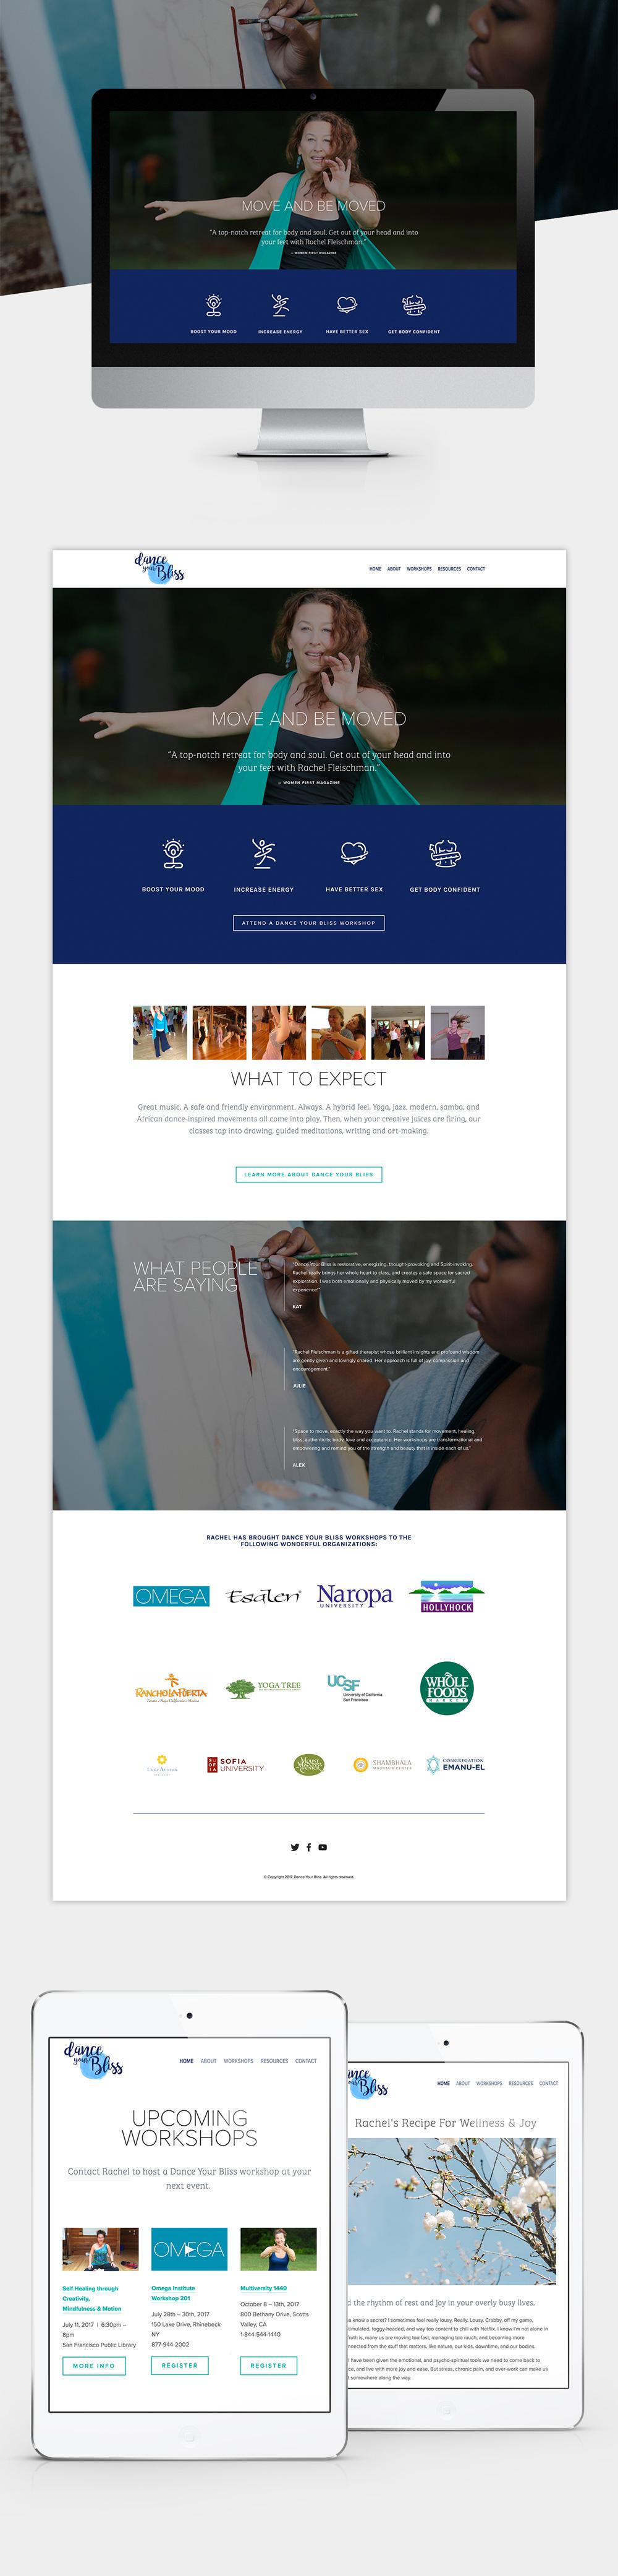 Web design and development by Vancouver designer, Jennifer Miranda Grigor //  jennifer-miranda.com